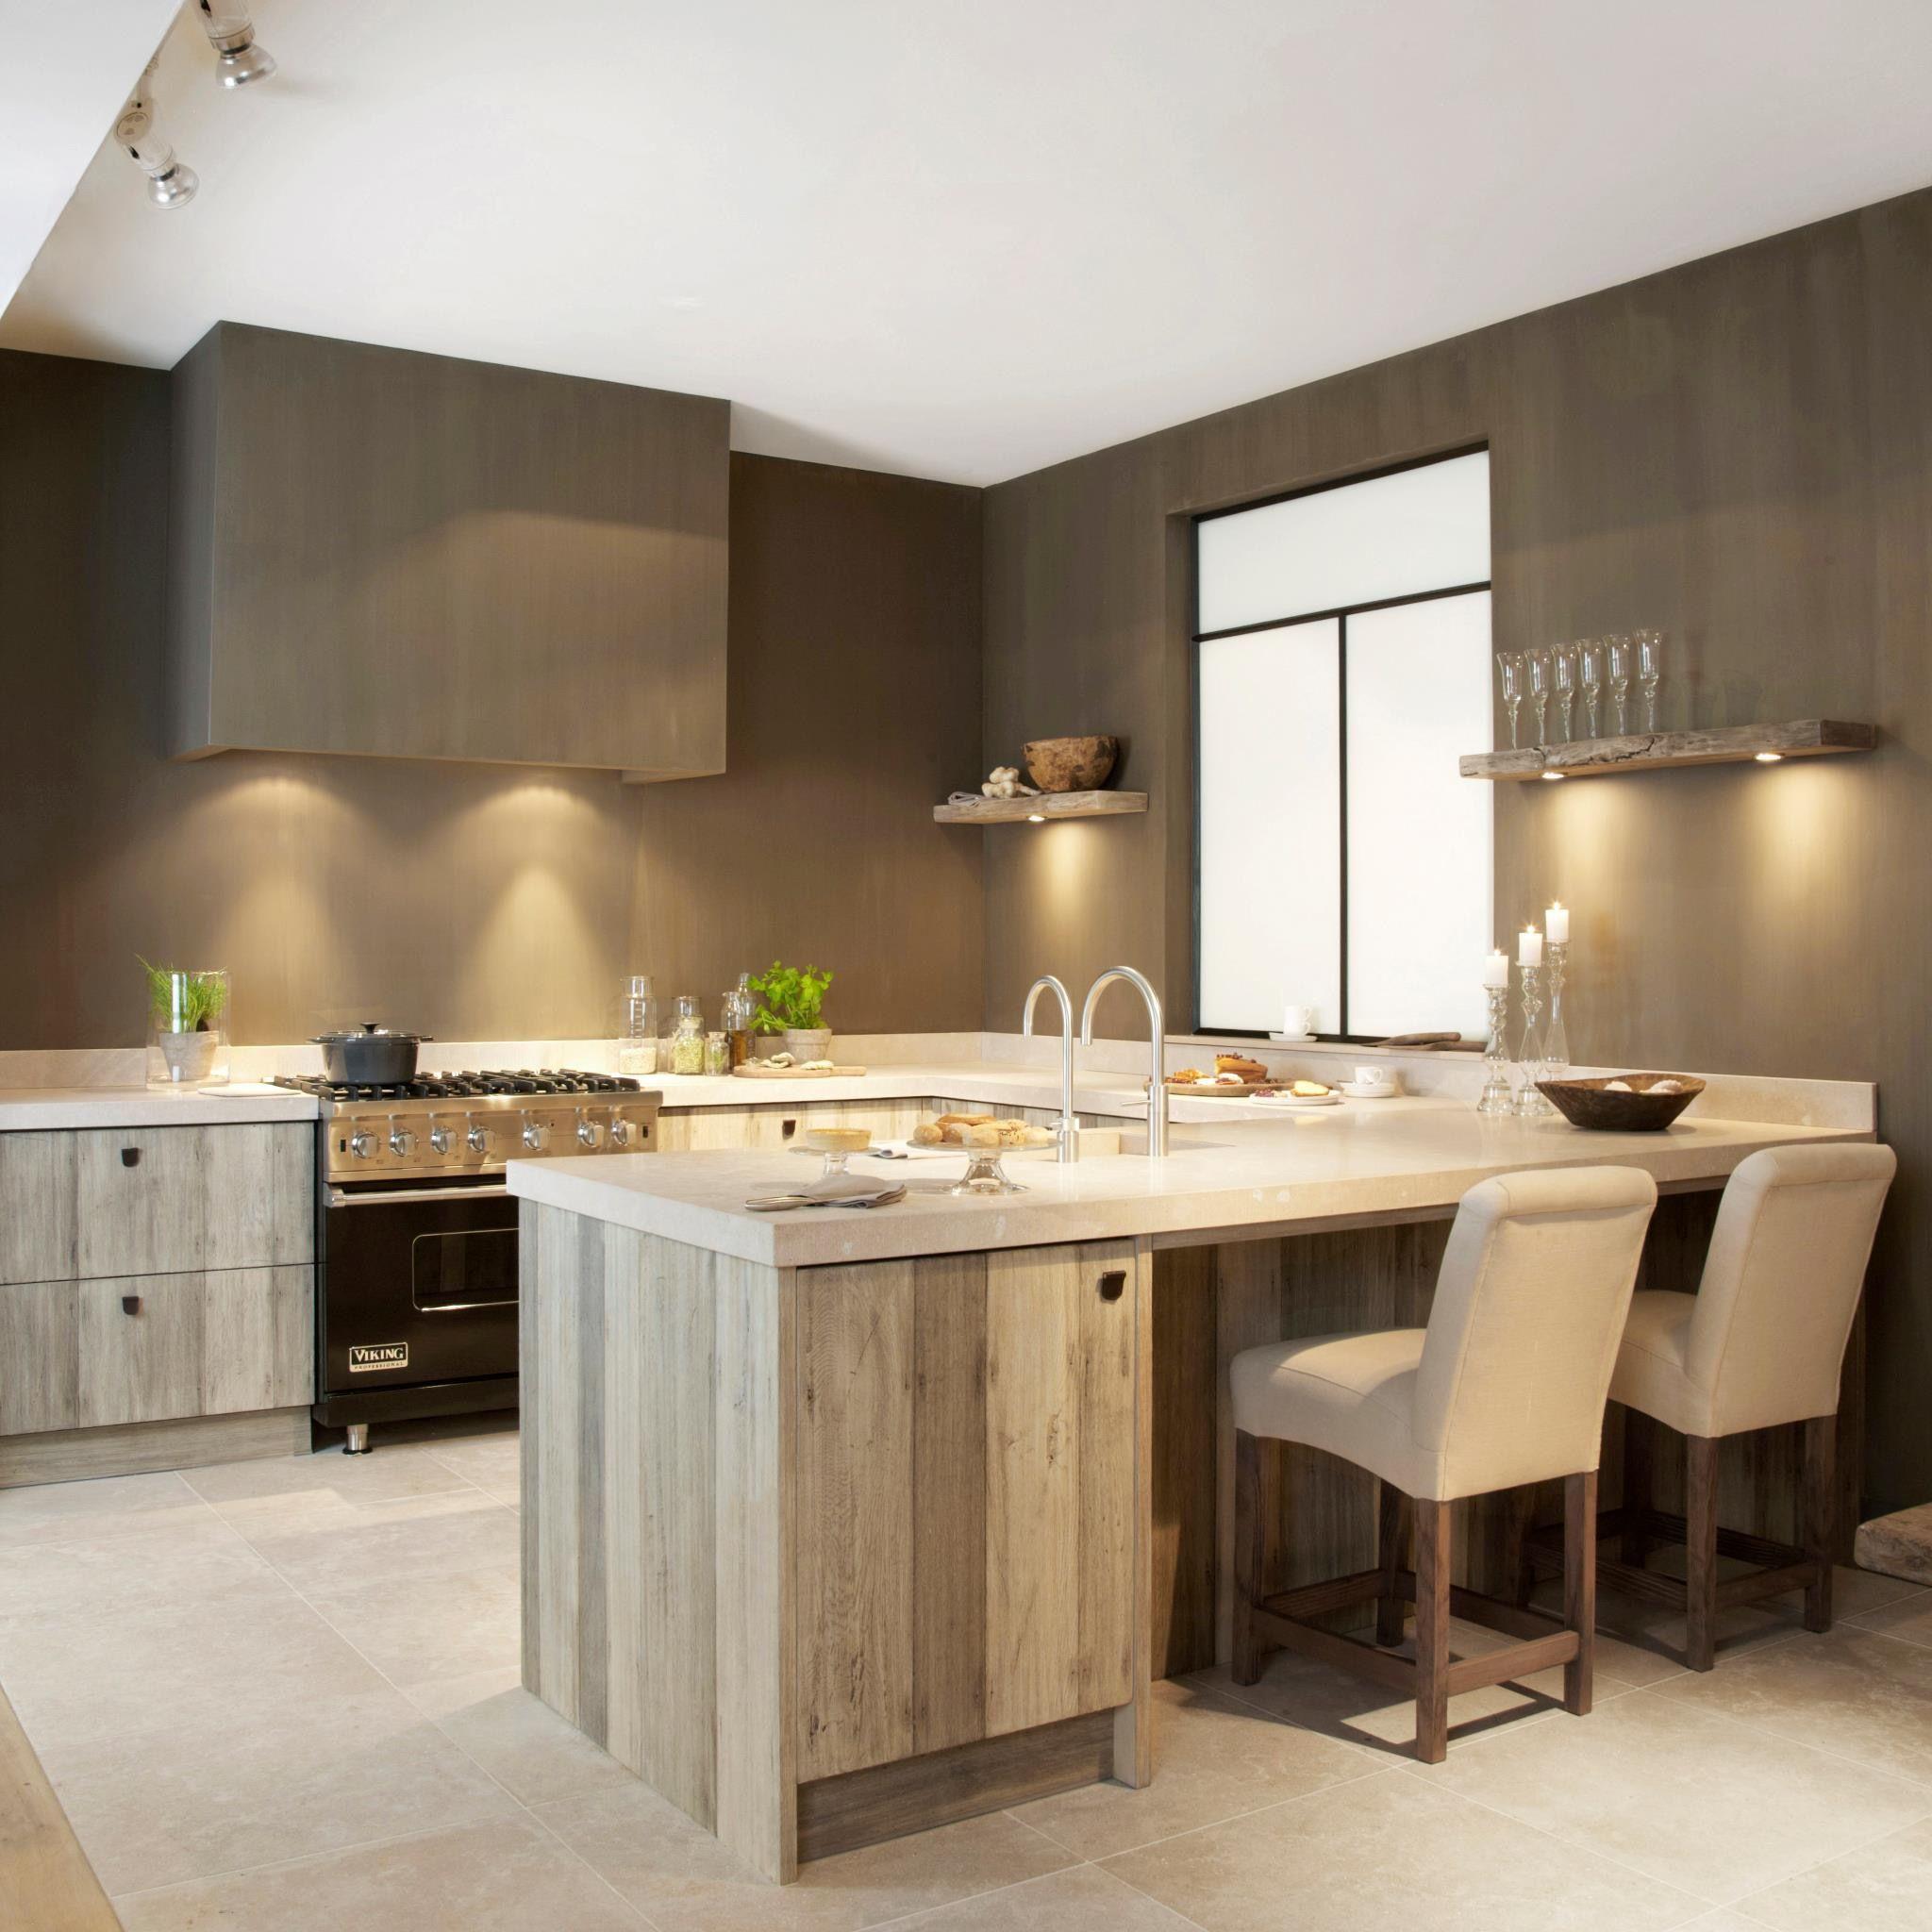 Pin Van Keren H Op Moderns Kitchens